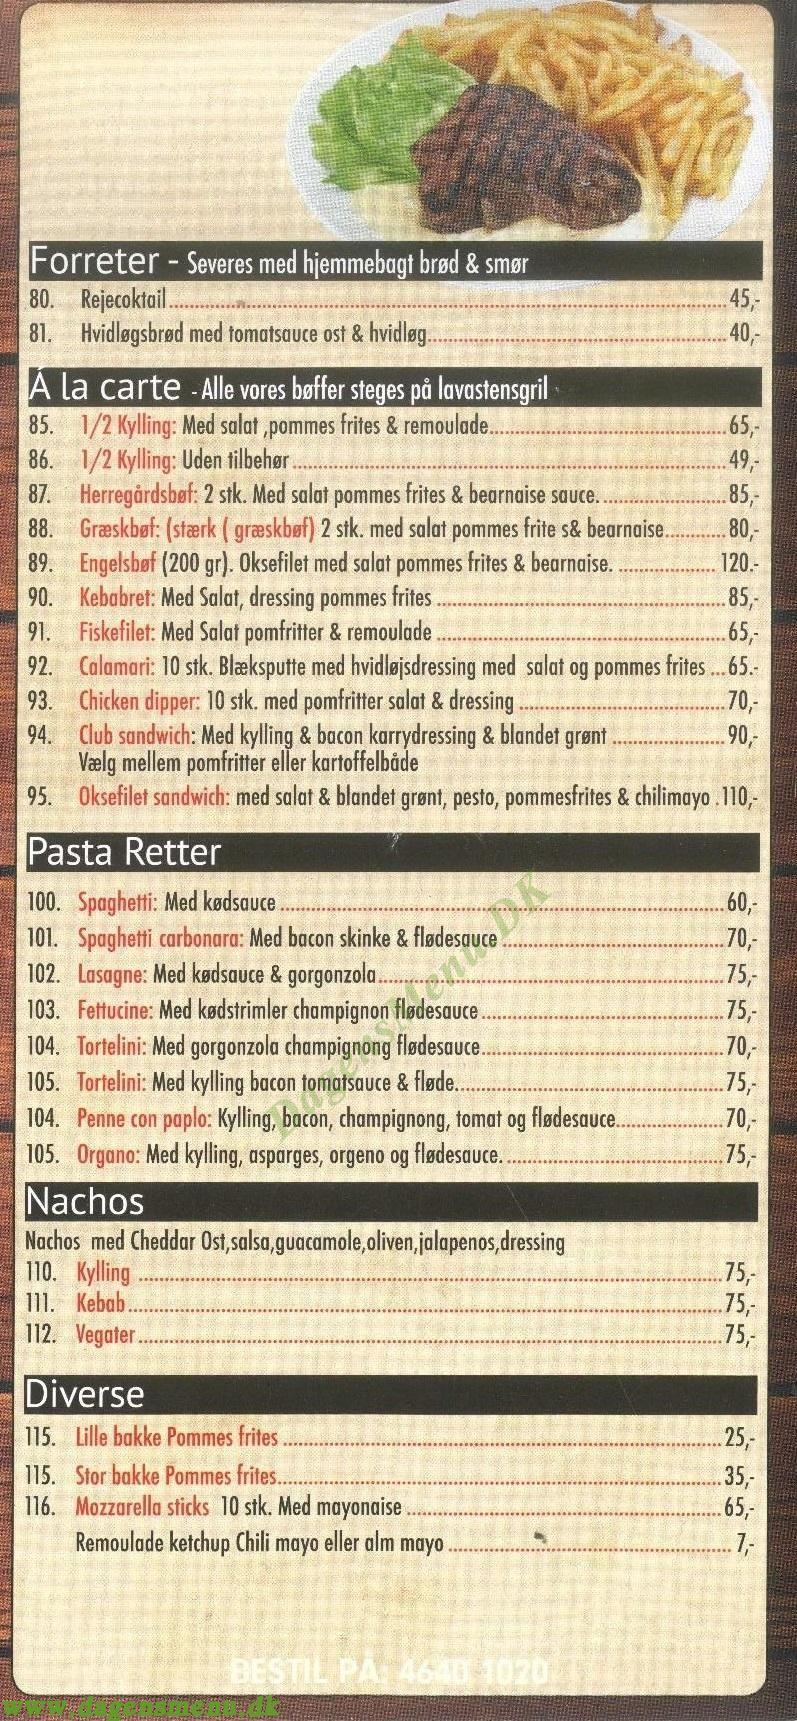 Marco Polo Pizza - Menukort